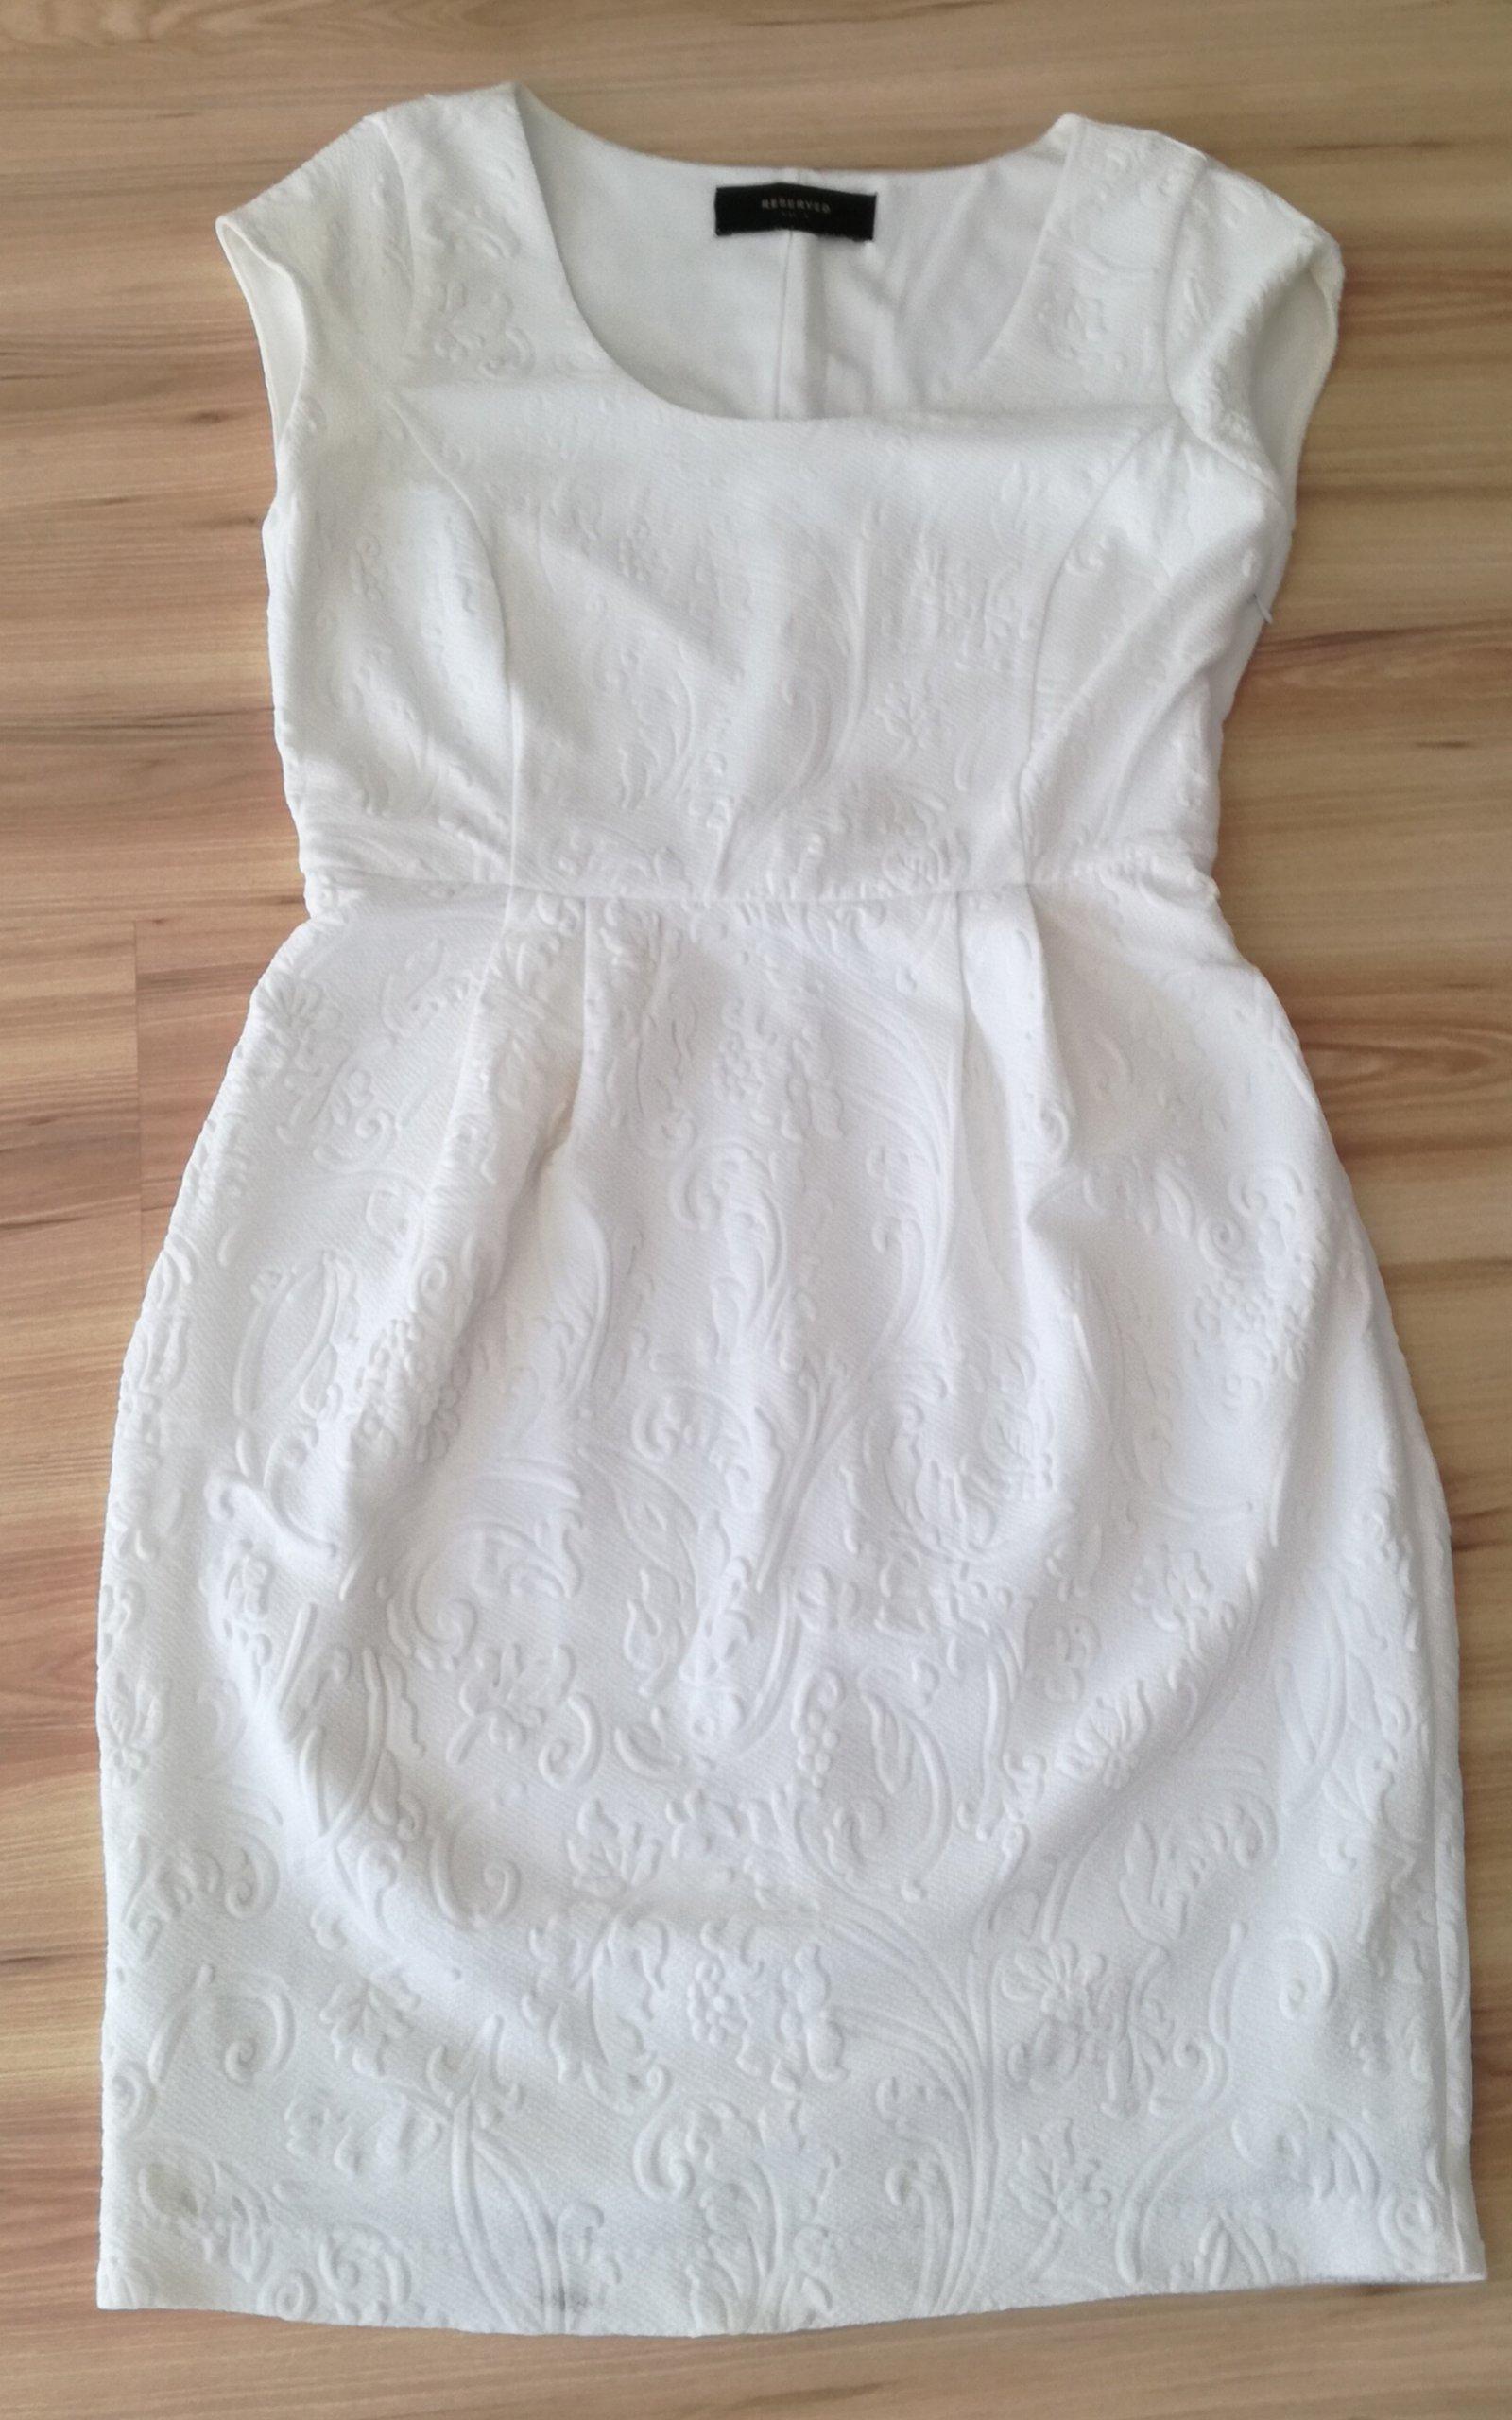 d029ea3025977 Sukienka Reserved rozm L - 7330996179 - oficjalne archiwum allegro